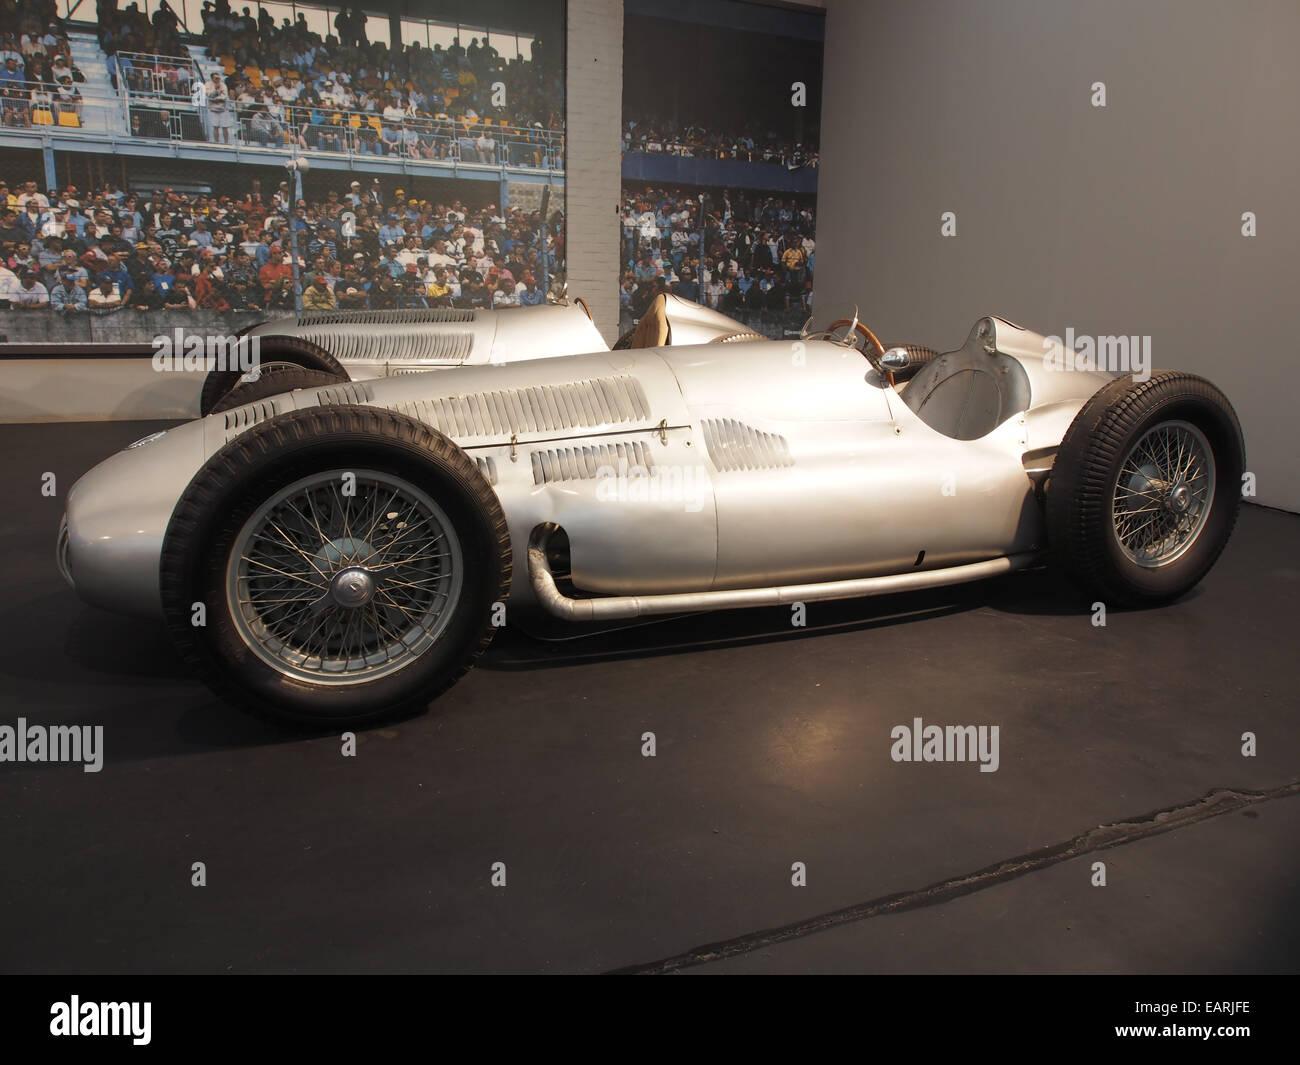 1939 Mercedes-Benz W154 Grand Prix, 12 cylinders, 2962cm3, 480hp, 280kmh, photo 2 Stock Photo